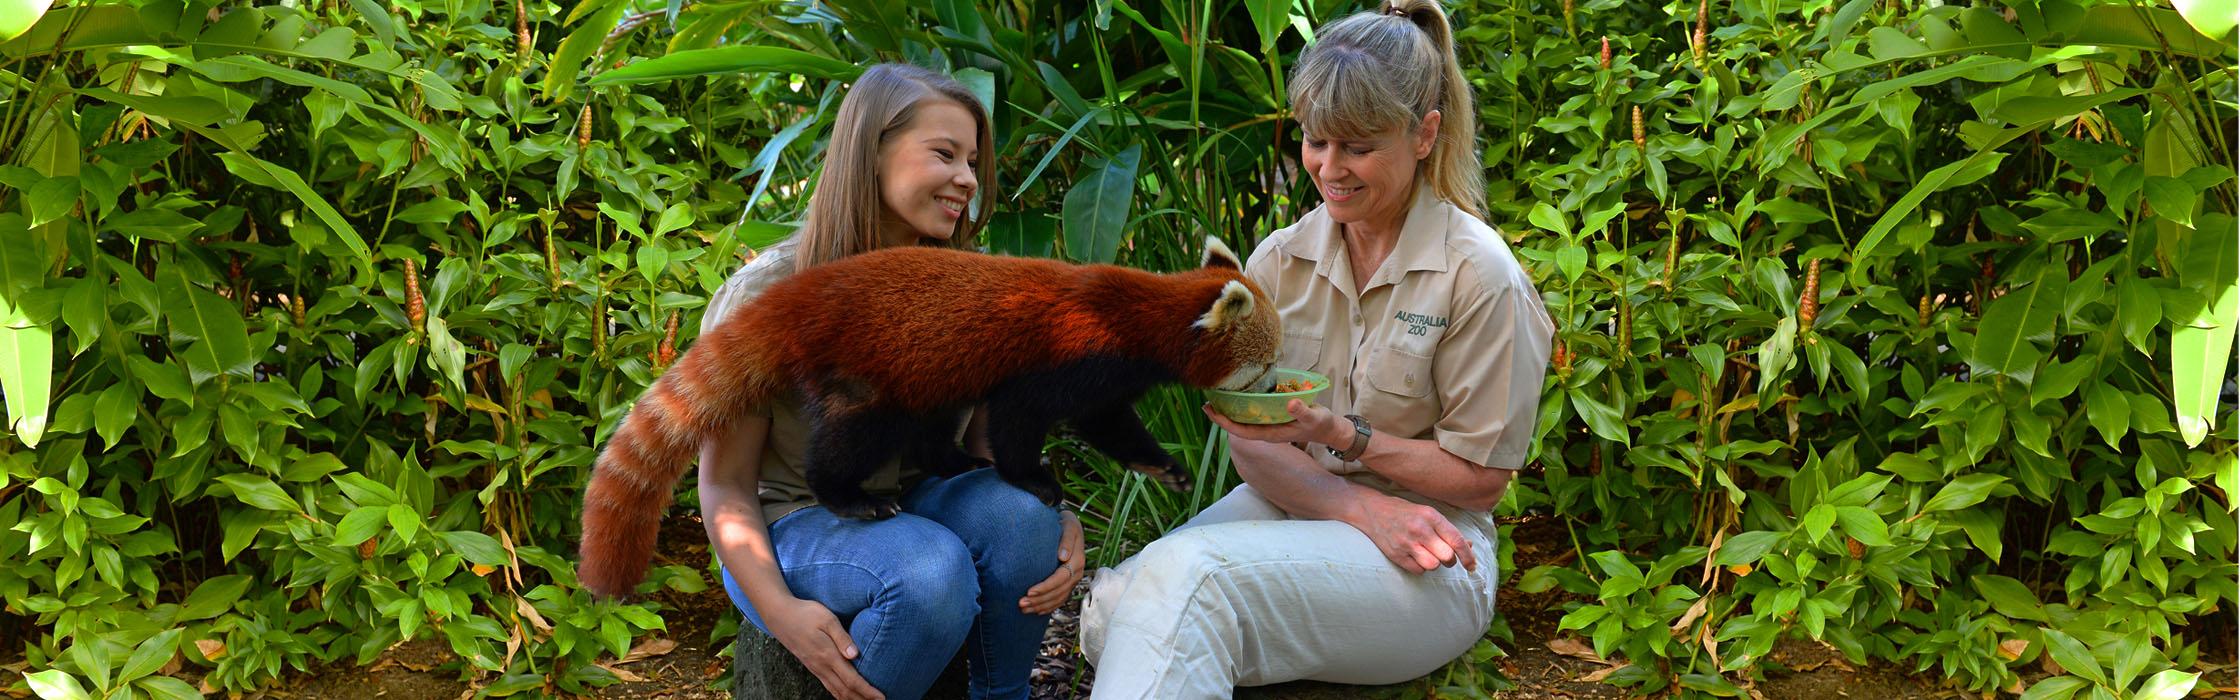 Experiences - Animal Encounters - Rascally Red Panda Encounter2240x700